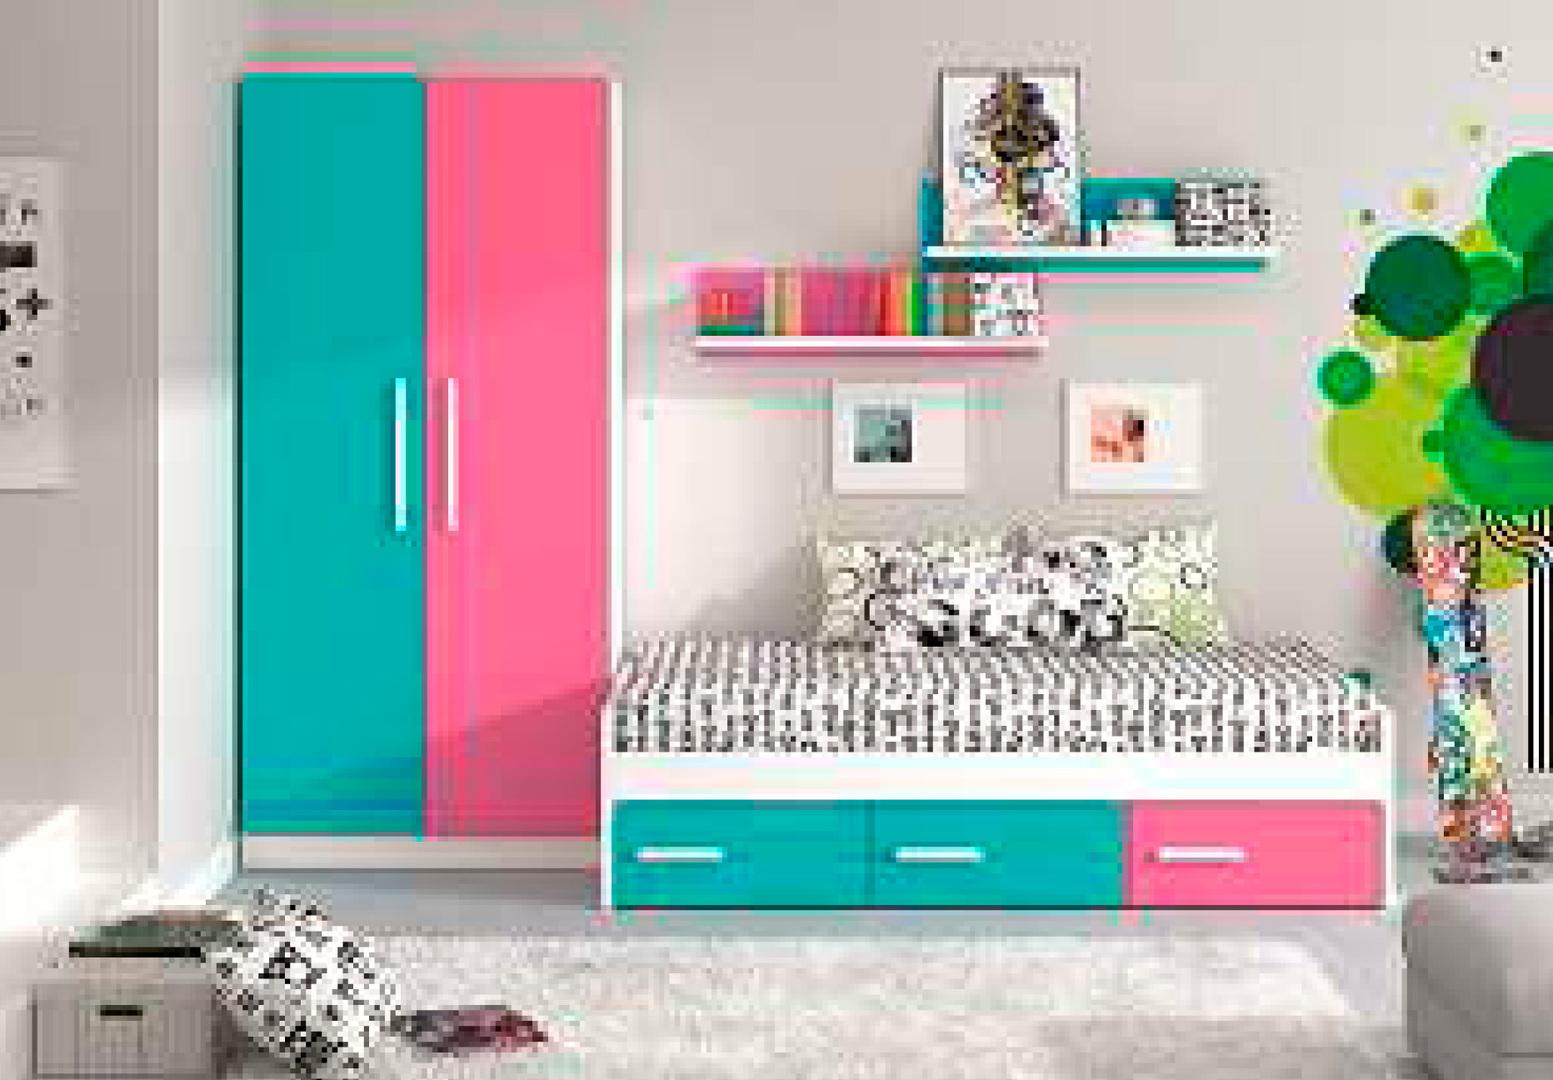 Dormitorio juvenil enjoy3 dormitorio juvenil daicarmobel for Decoracion hogar lleida